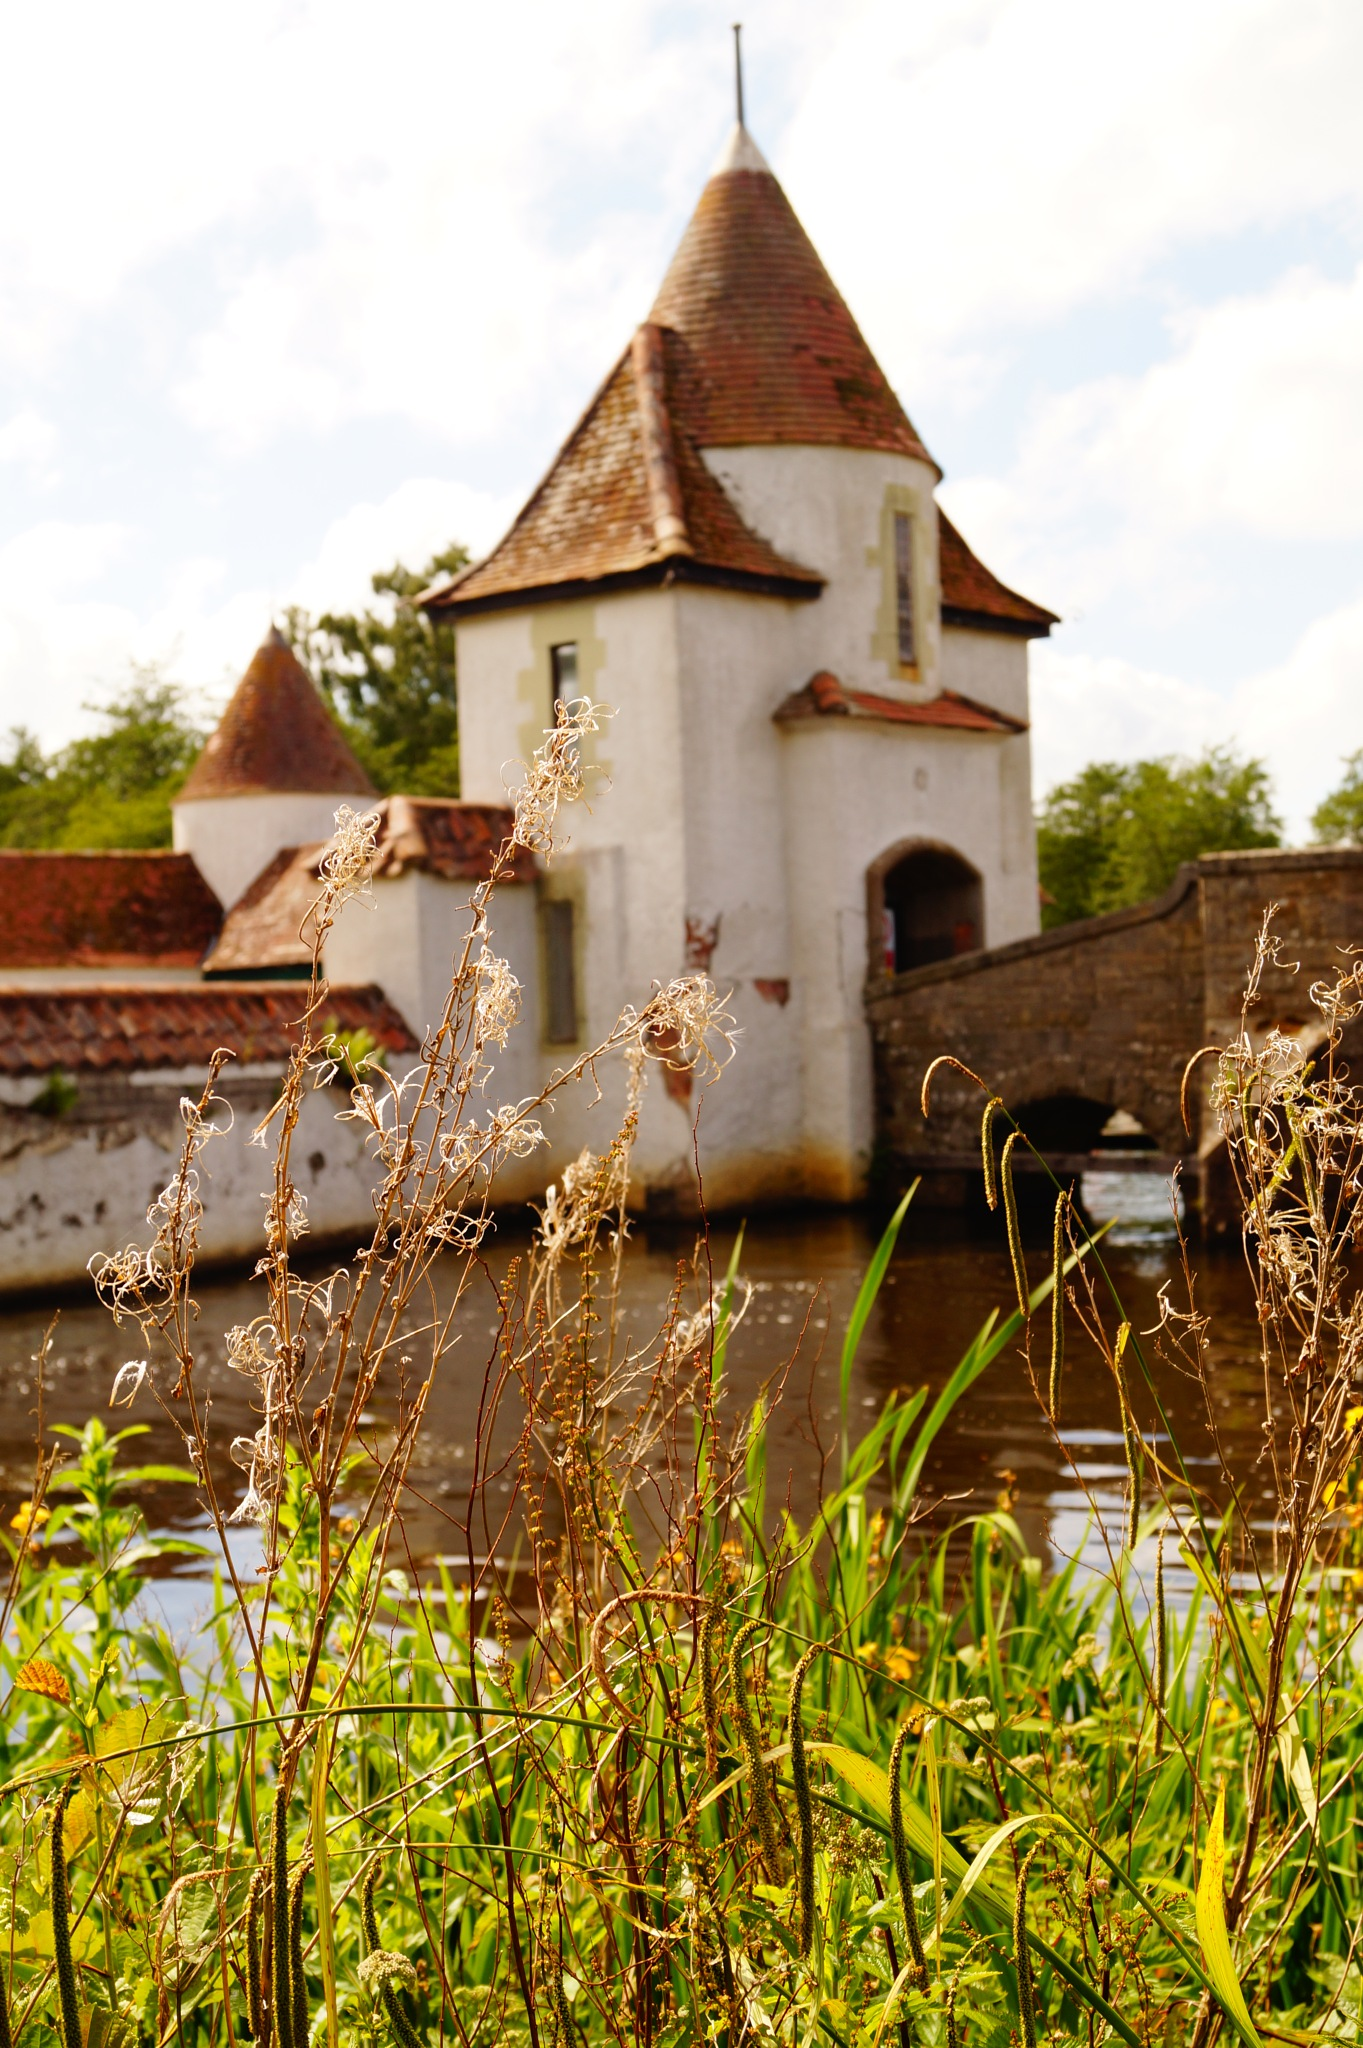 Castles by chiaravilla95